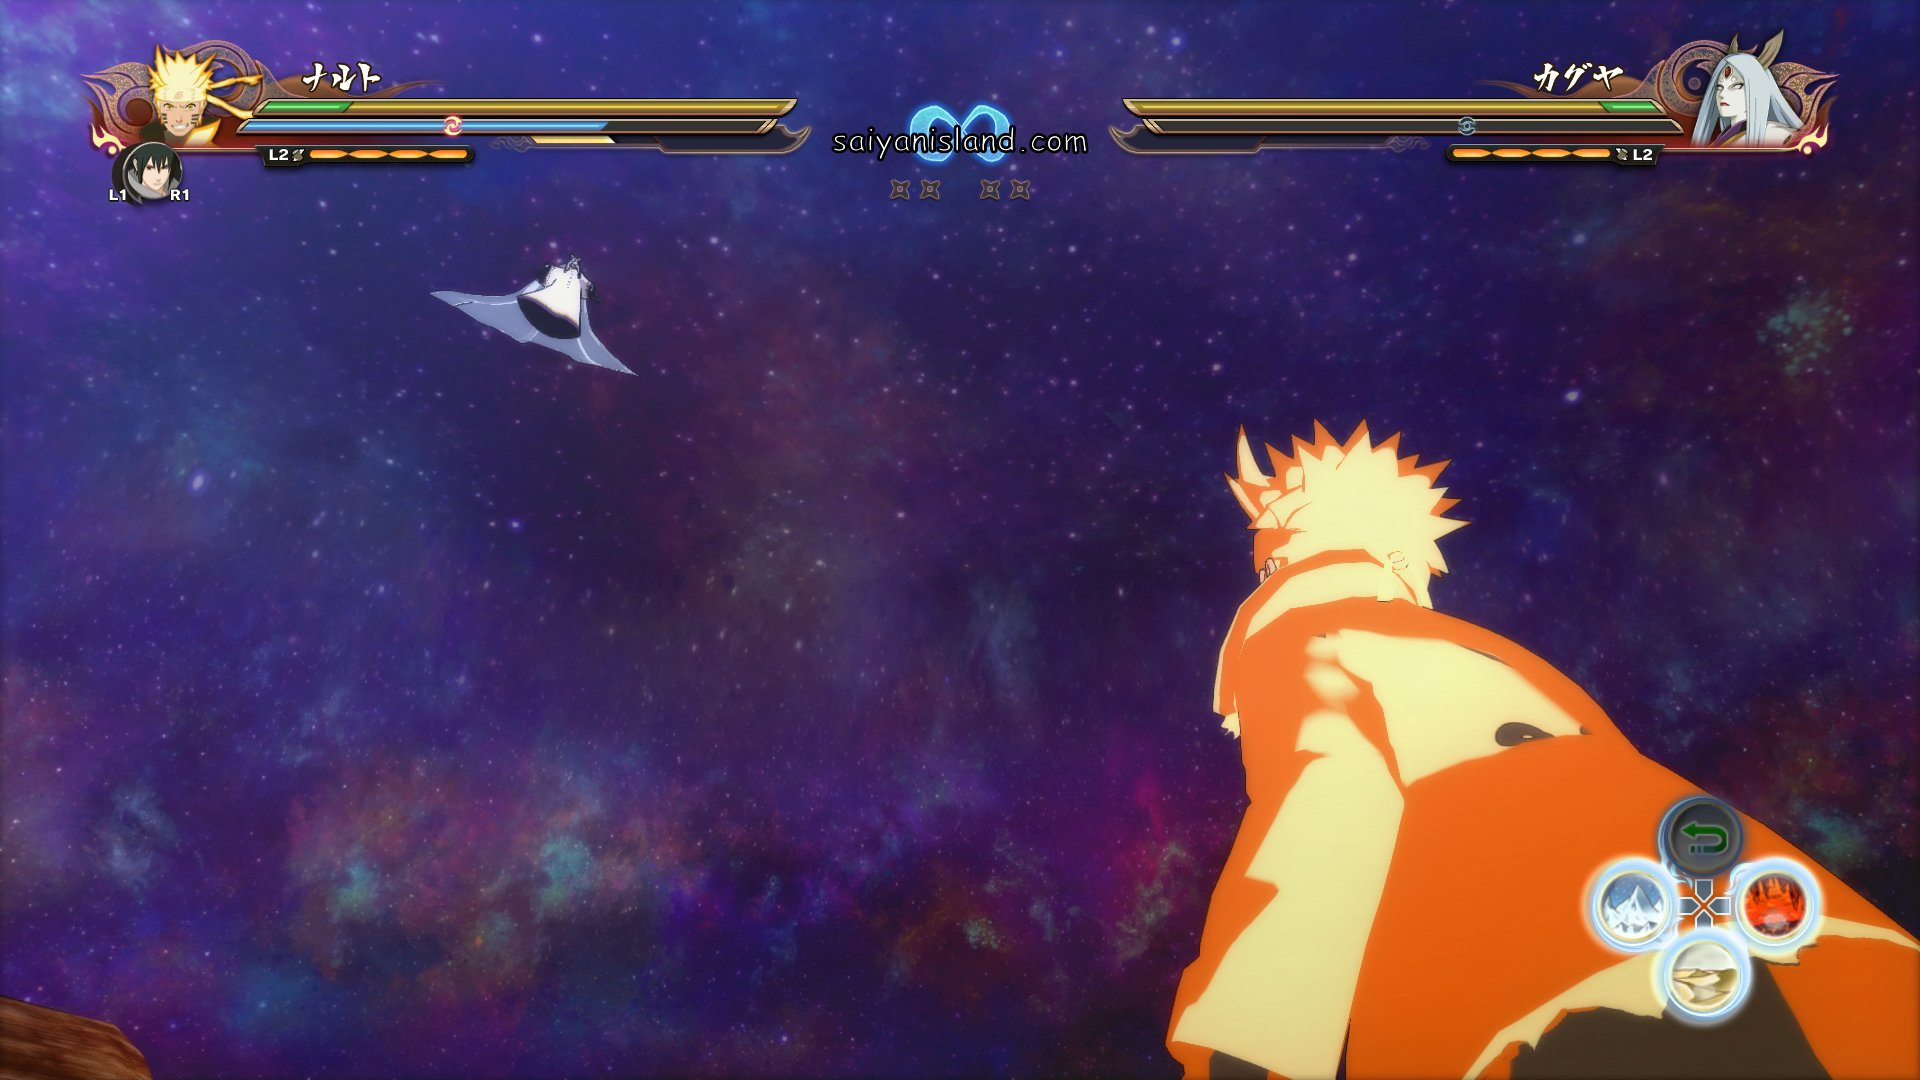 Naruto-Storm-4-8 Naruto Storm 4: Yeni Kuyruklu Canavar Kaguya Ekran Görüntüleri